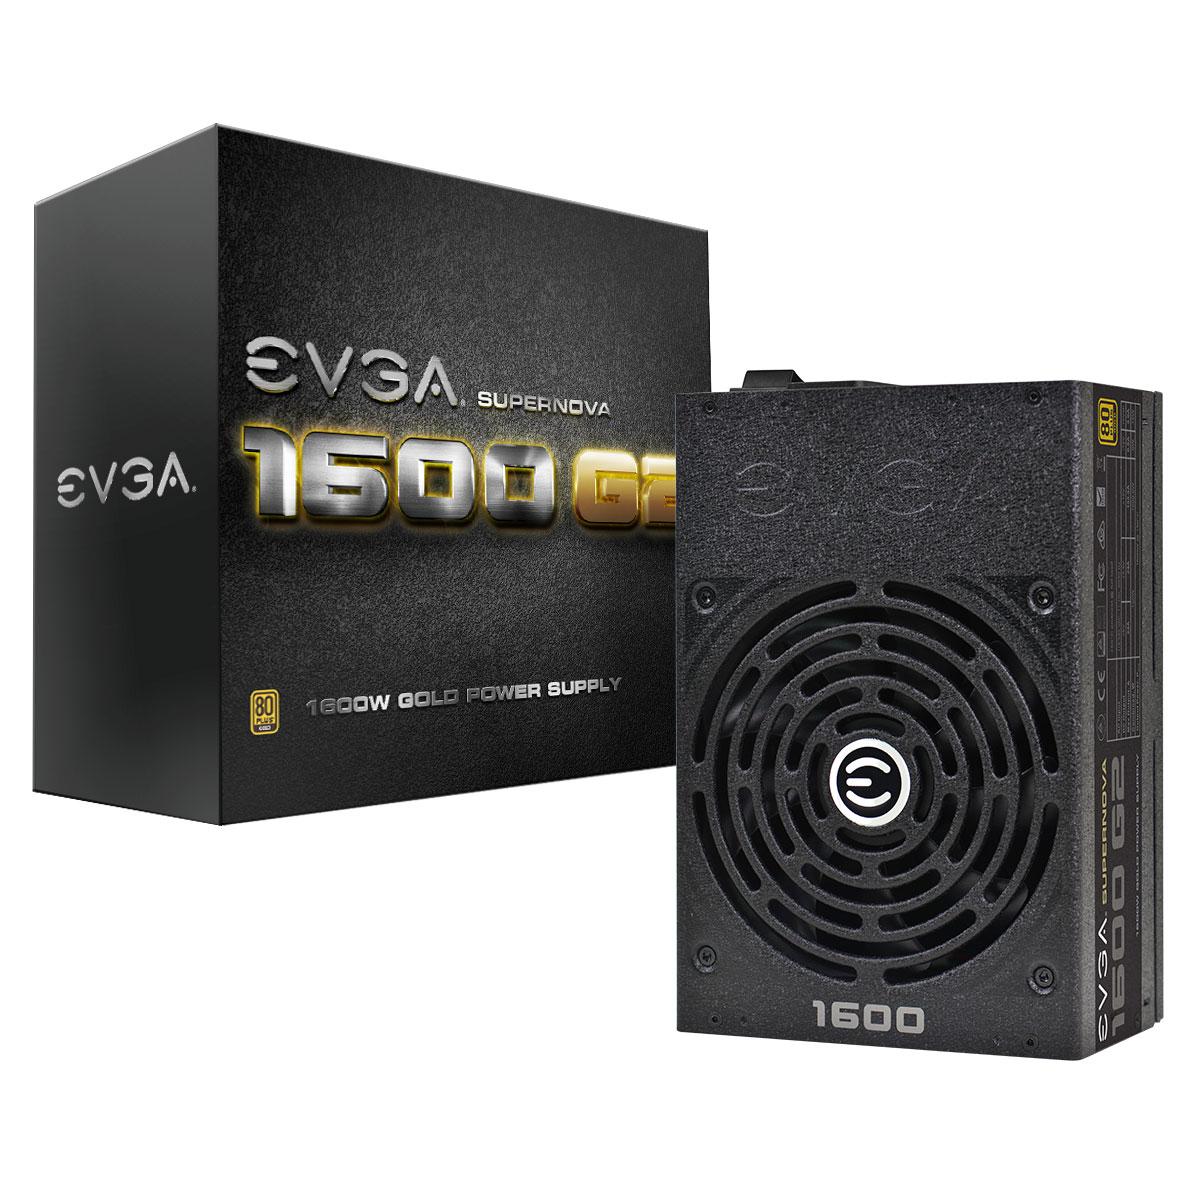 EVGA SuperNOVA 1600w G2 80+ MODULAR GOLD PSU